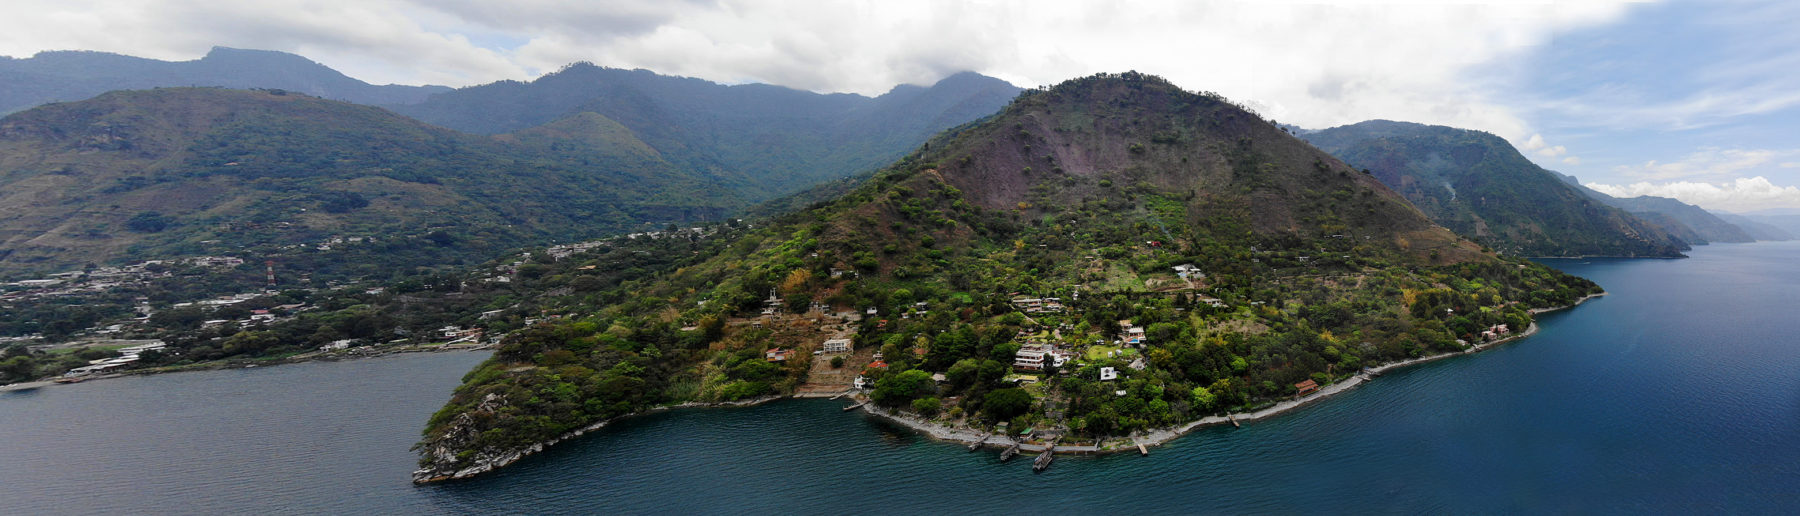 Lieblingsplatz: Lago Atitlan